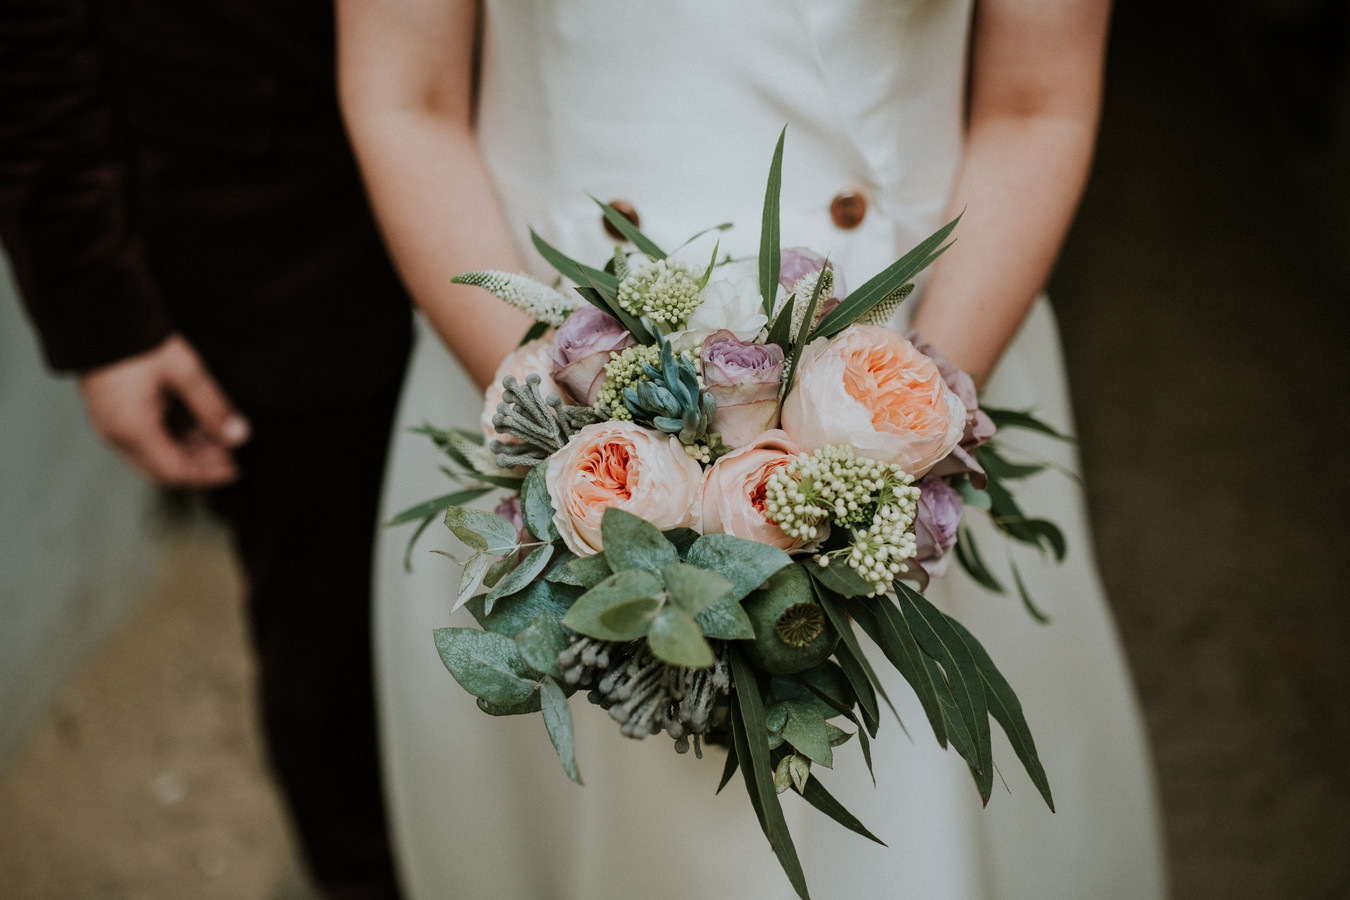 Vestuvinė puokštė Floritiska: dkdizainas.lt Foto: Couple Cups